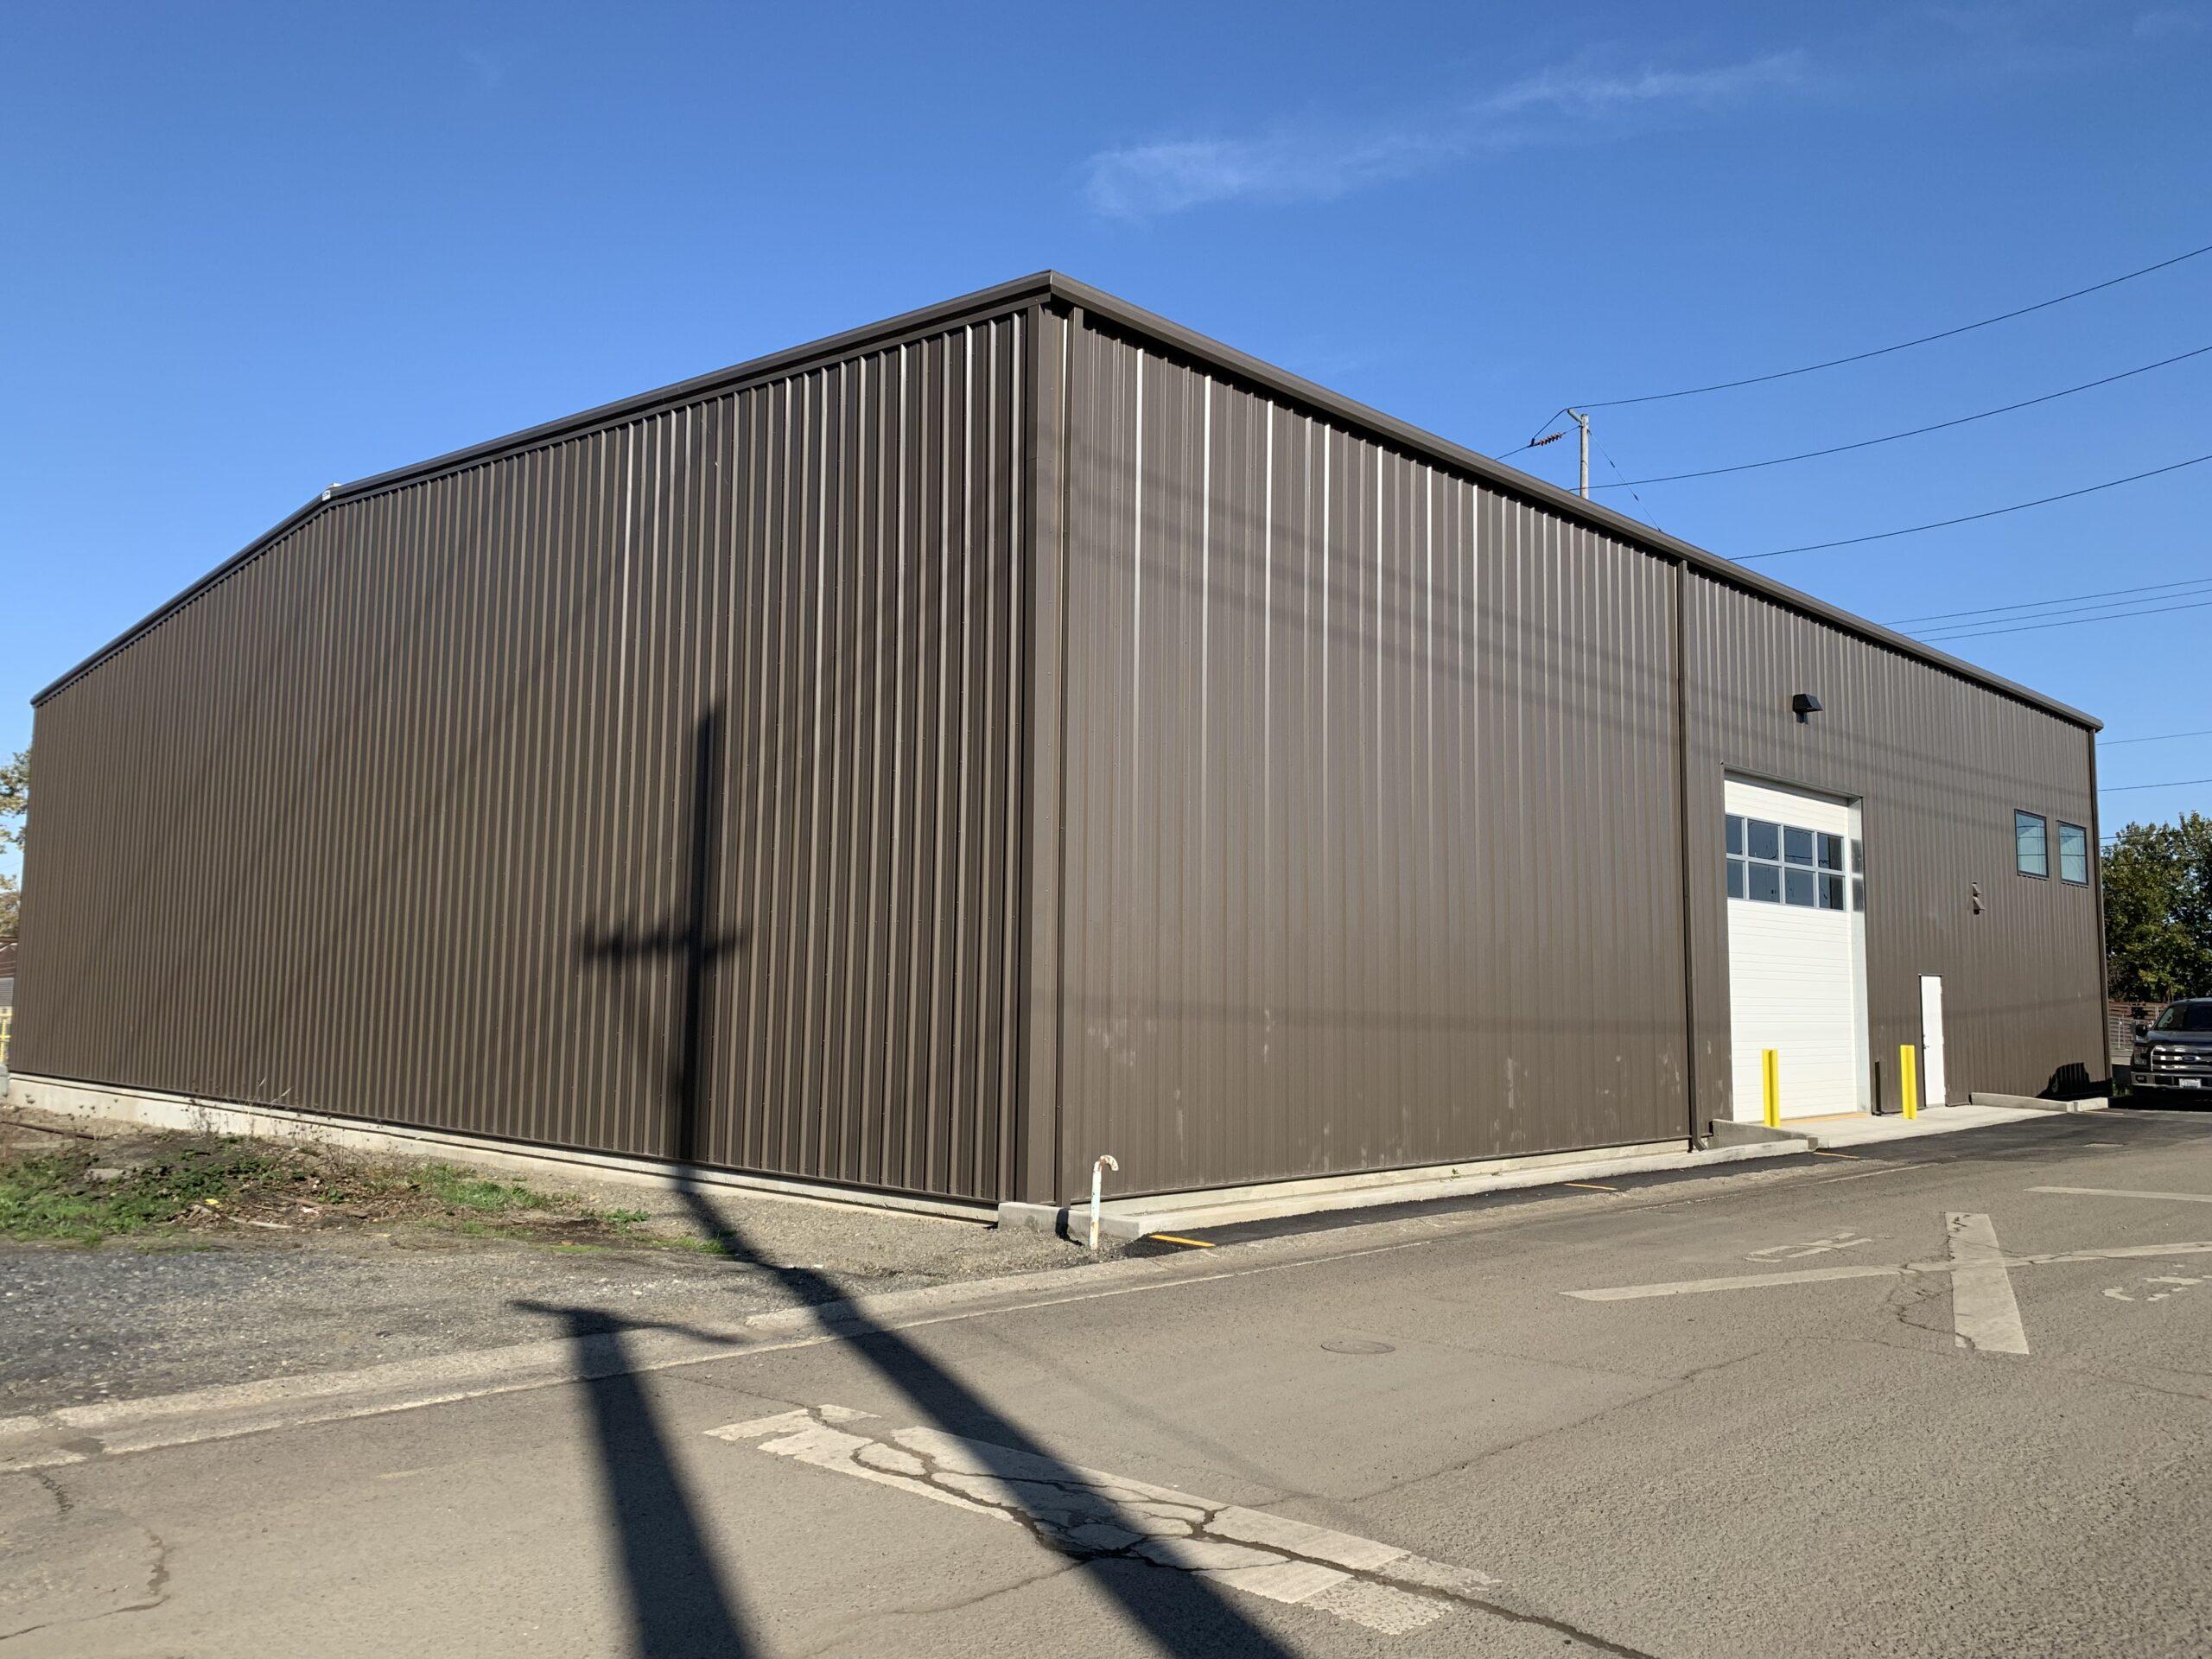 Harmer Steel Products in Portland, Oregon